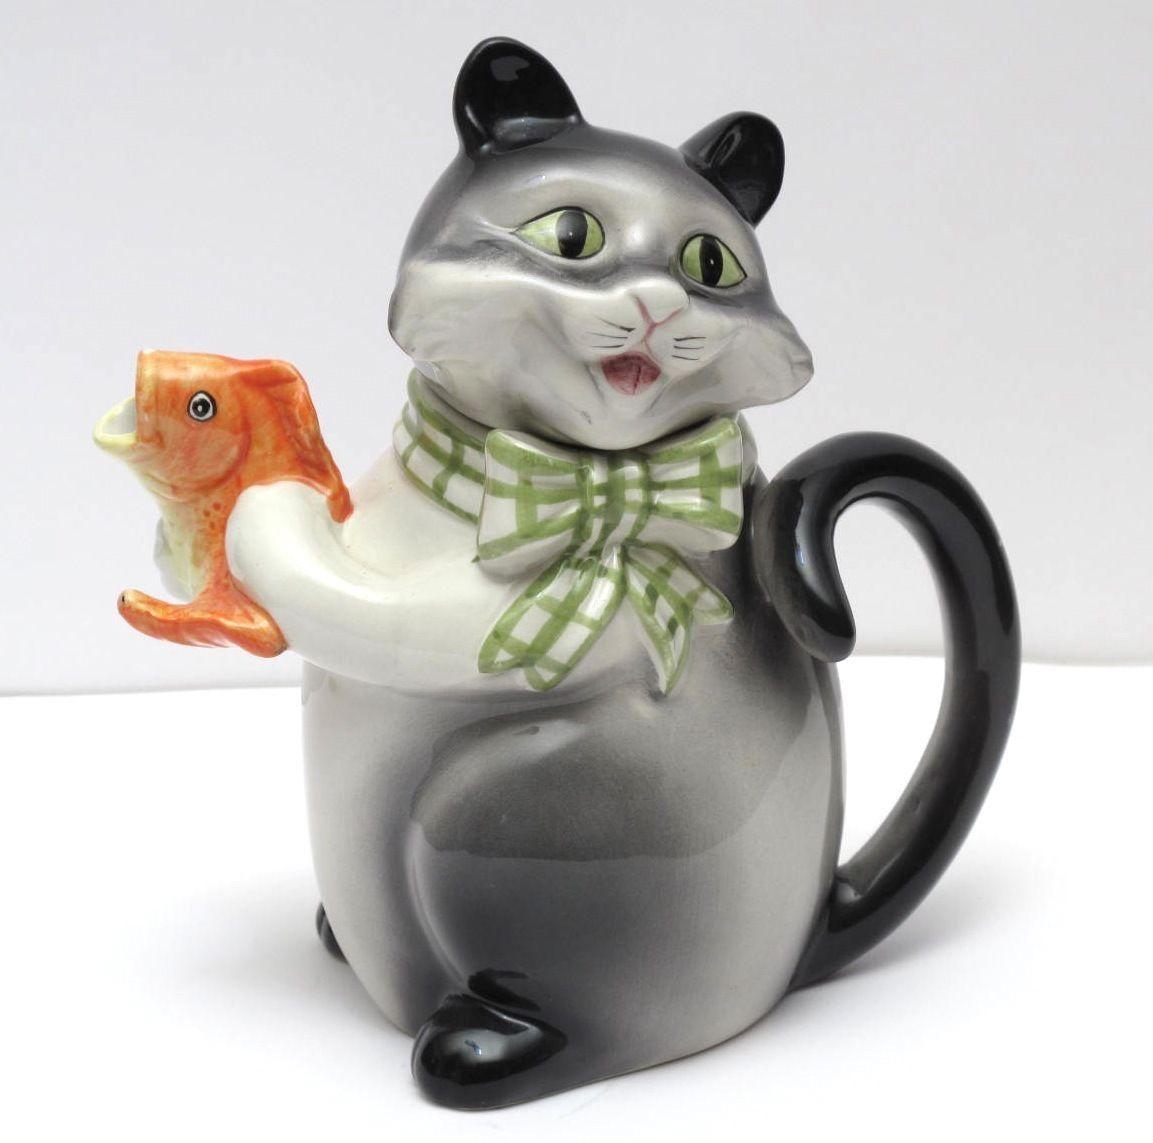 Pottery Barn Kids Pink Ceramic Classic Tea Cup Saucer